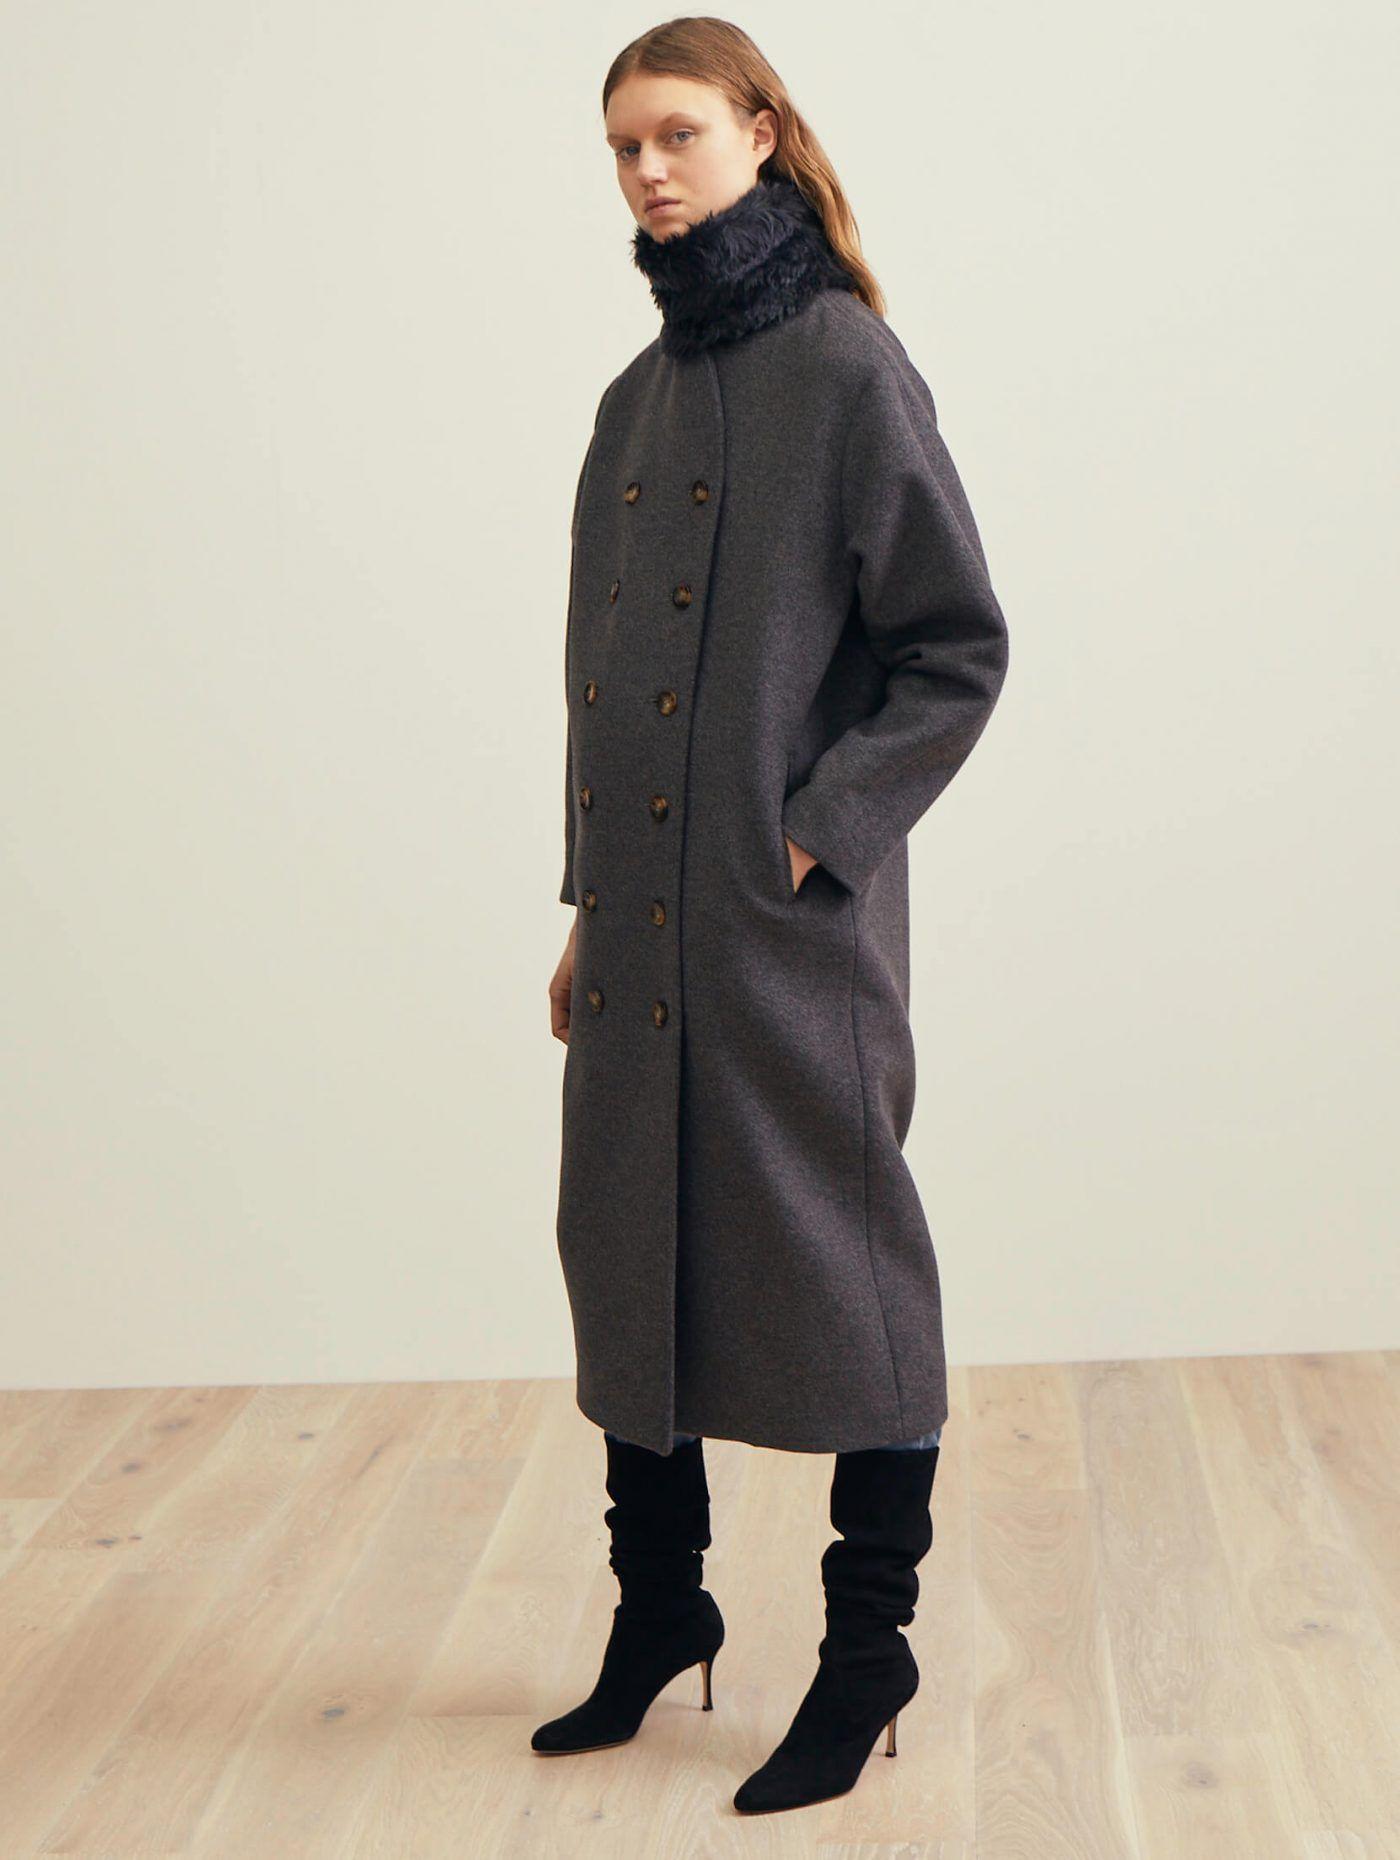 270d4d063152 Bergerac wool coat grey melange   Toteme18   Fashion, Coat, Wool coat